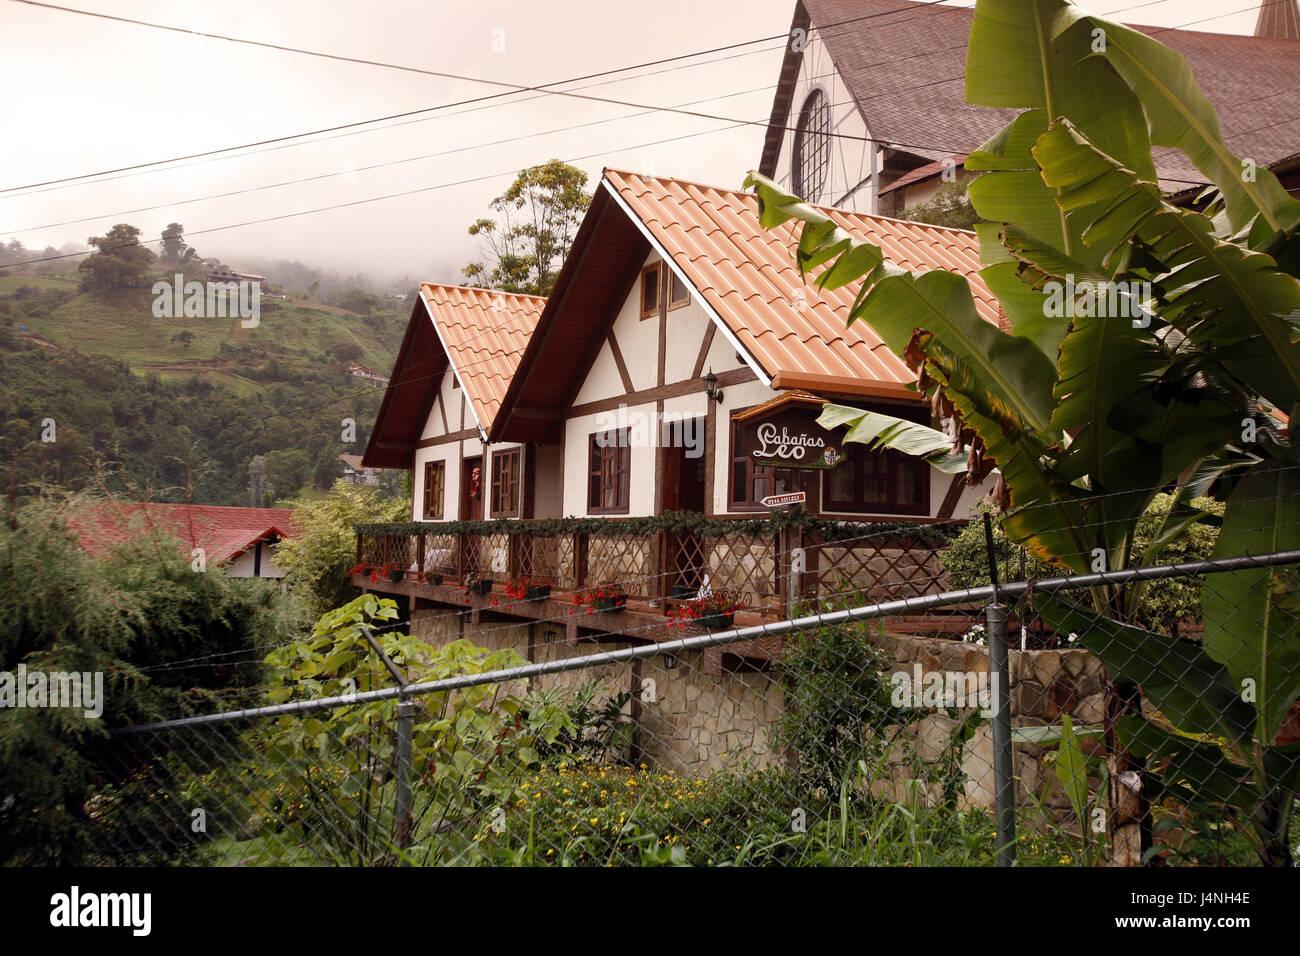 Venezuela Colonia Tovar German Colony Houses